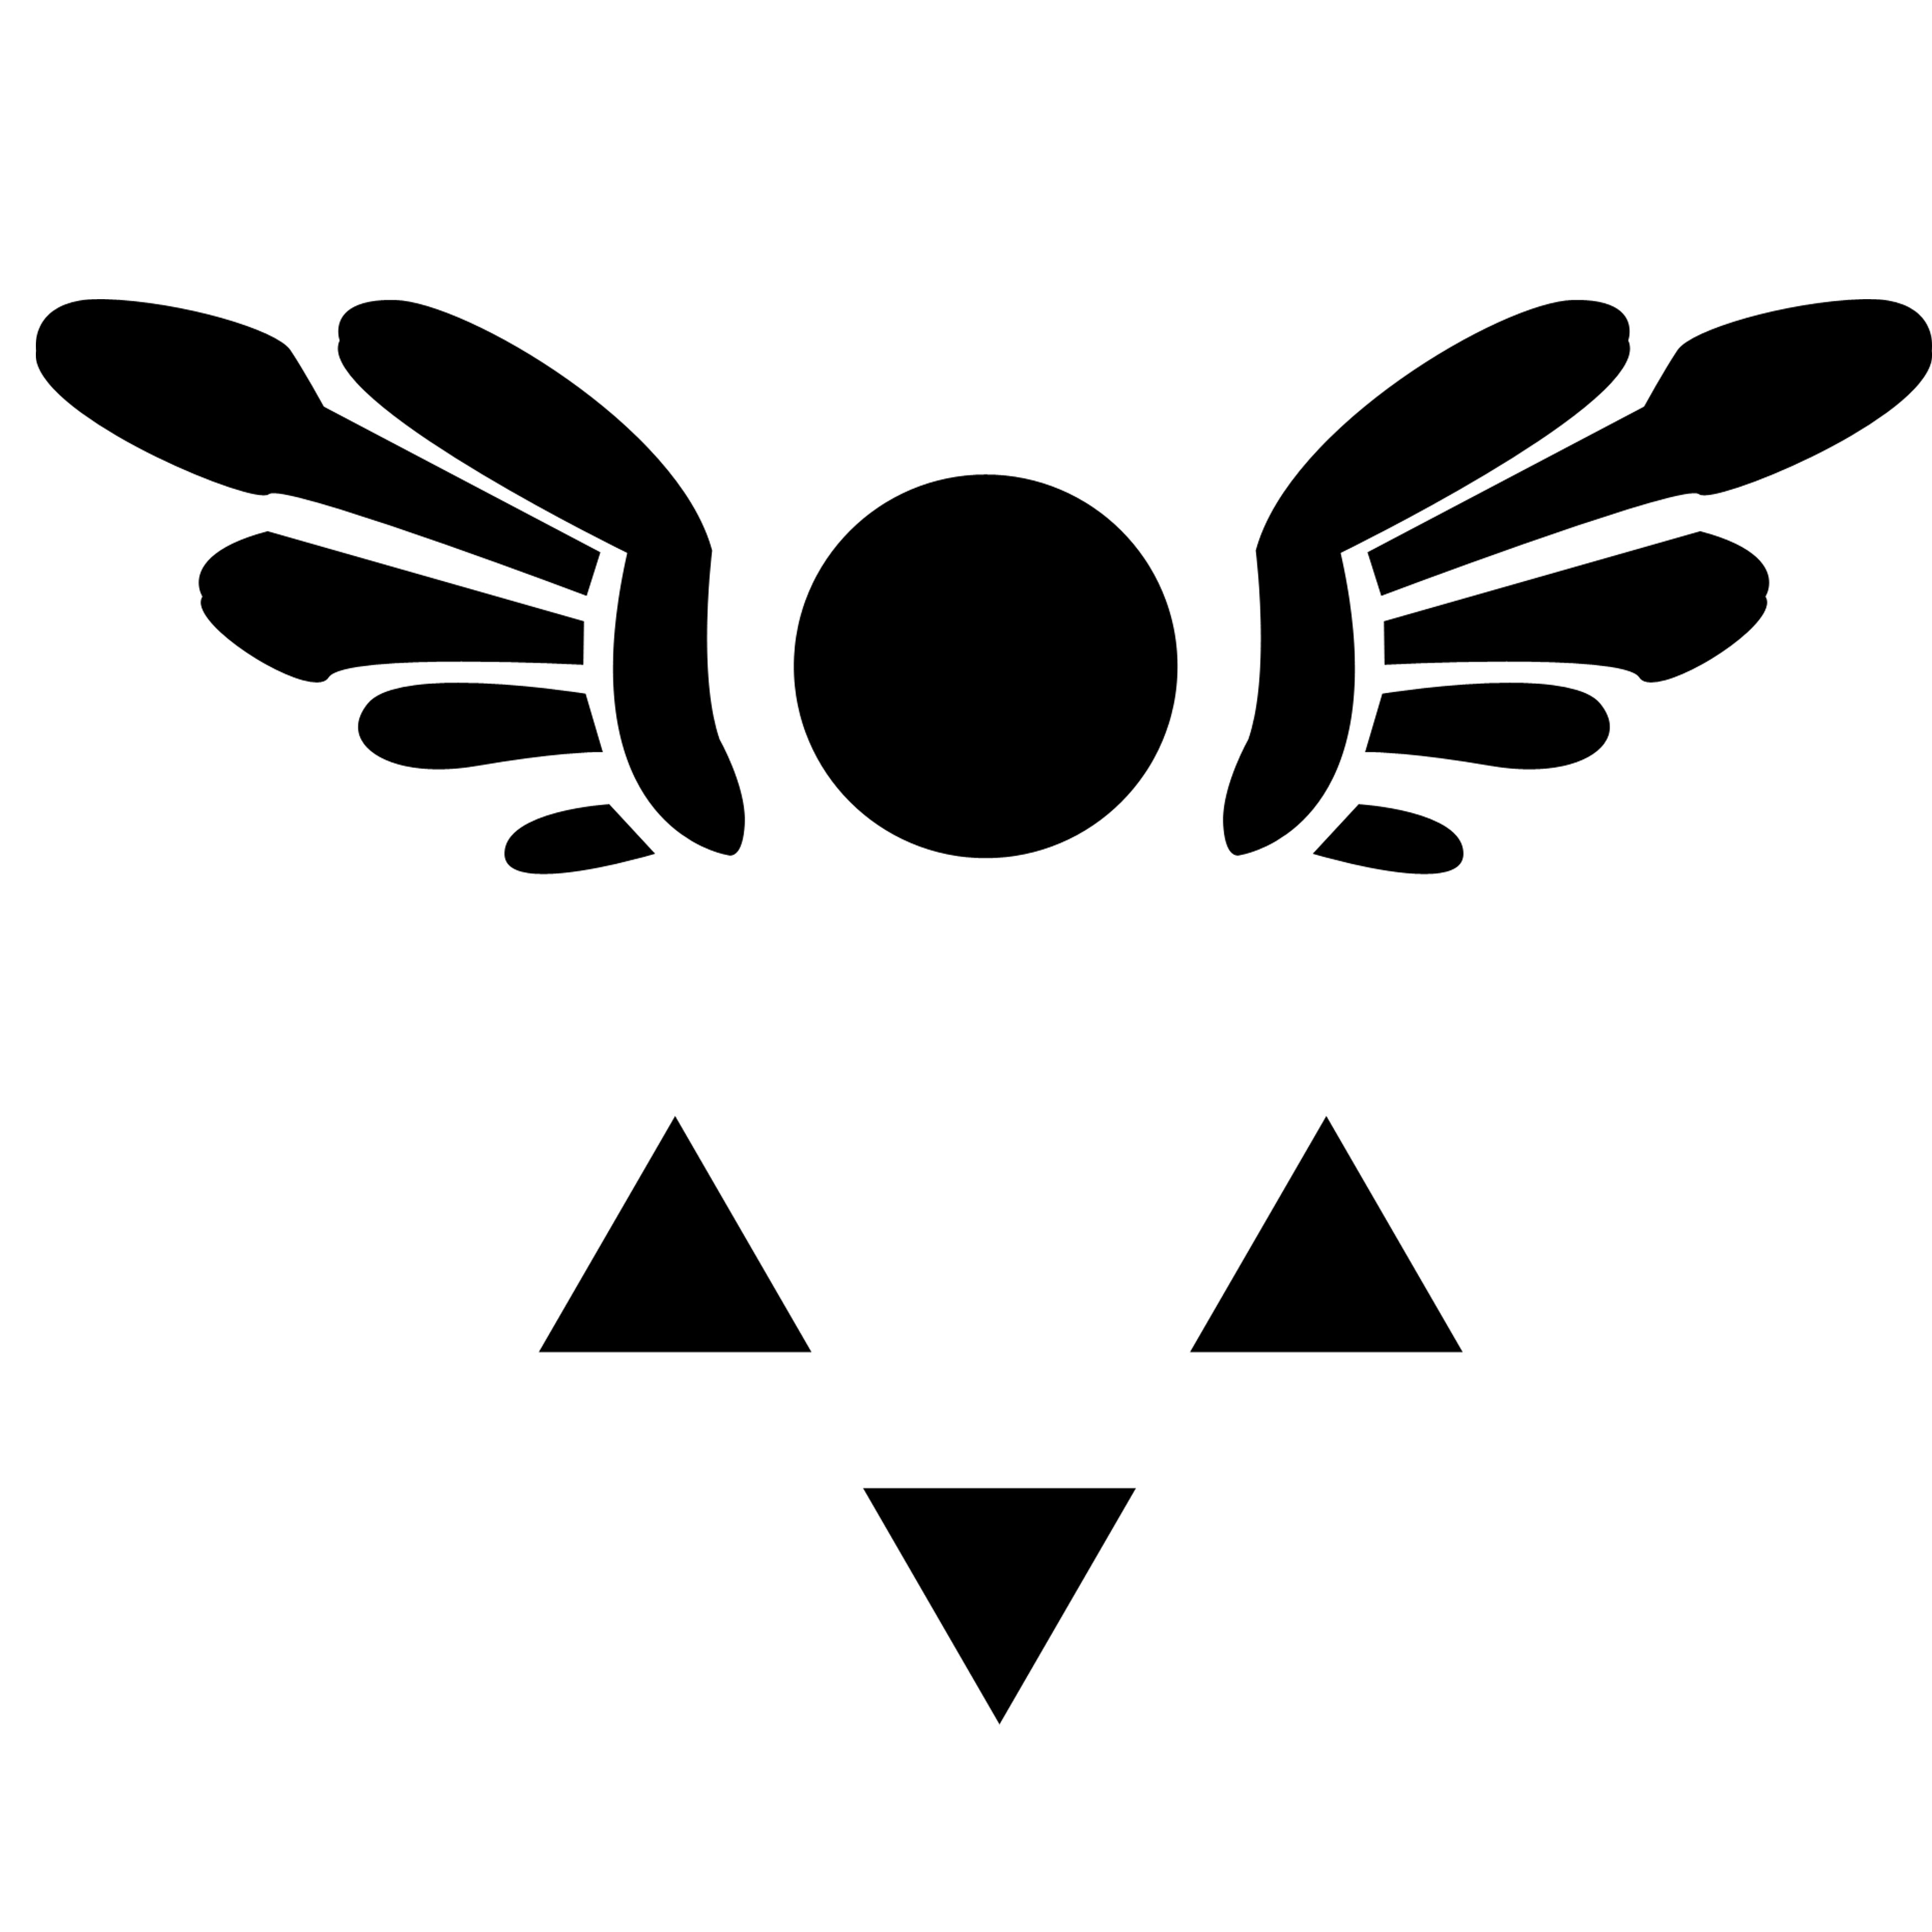 Undertale Series Symbol Delta Rune By Highpoweredart On Deviantart